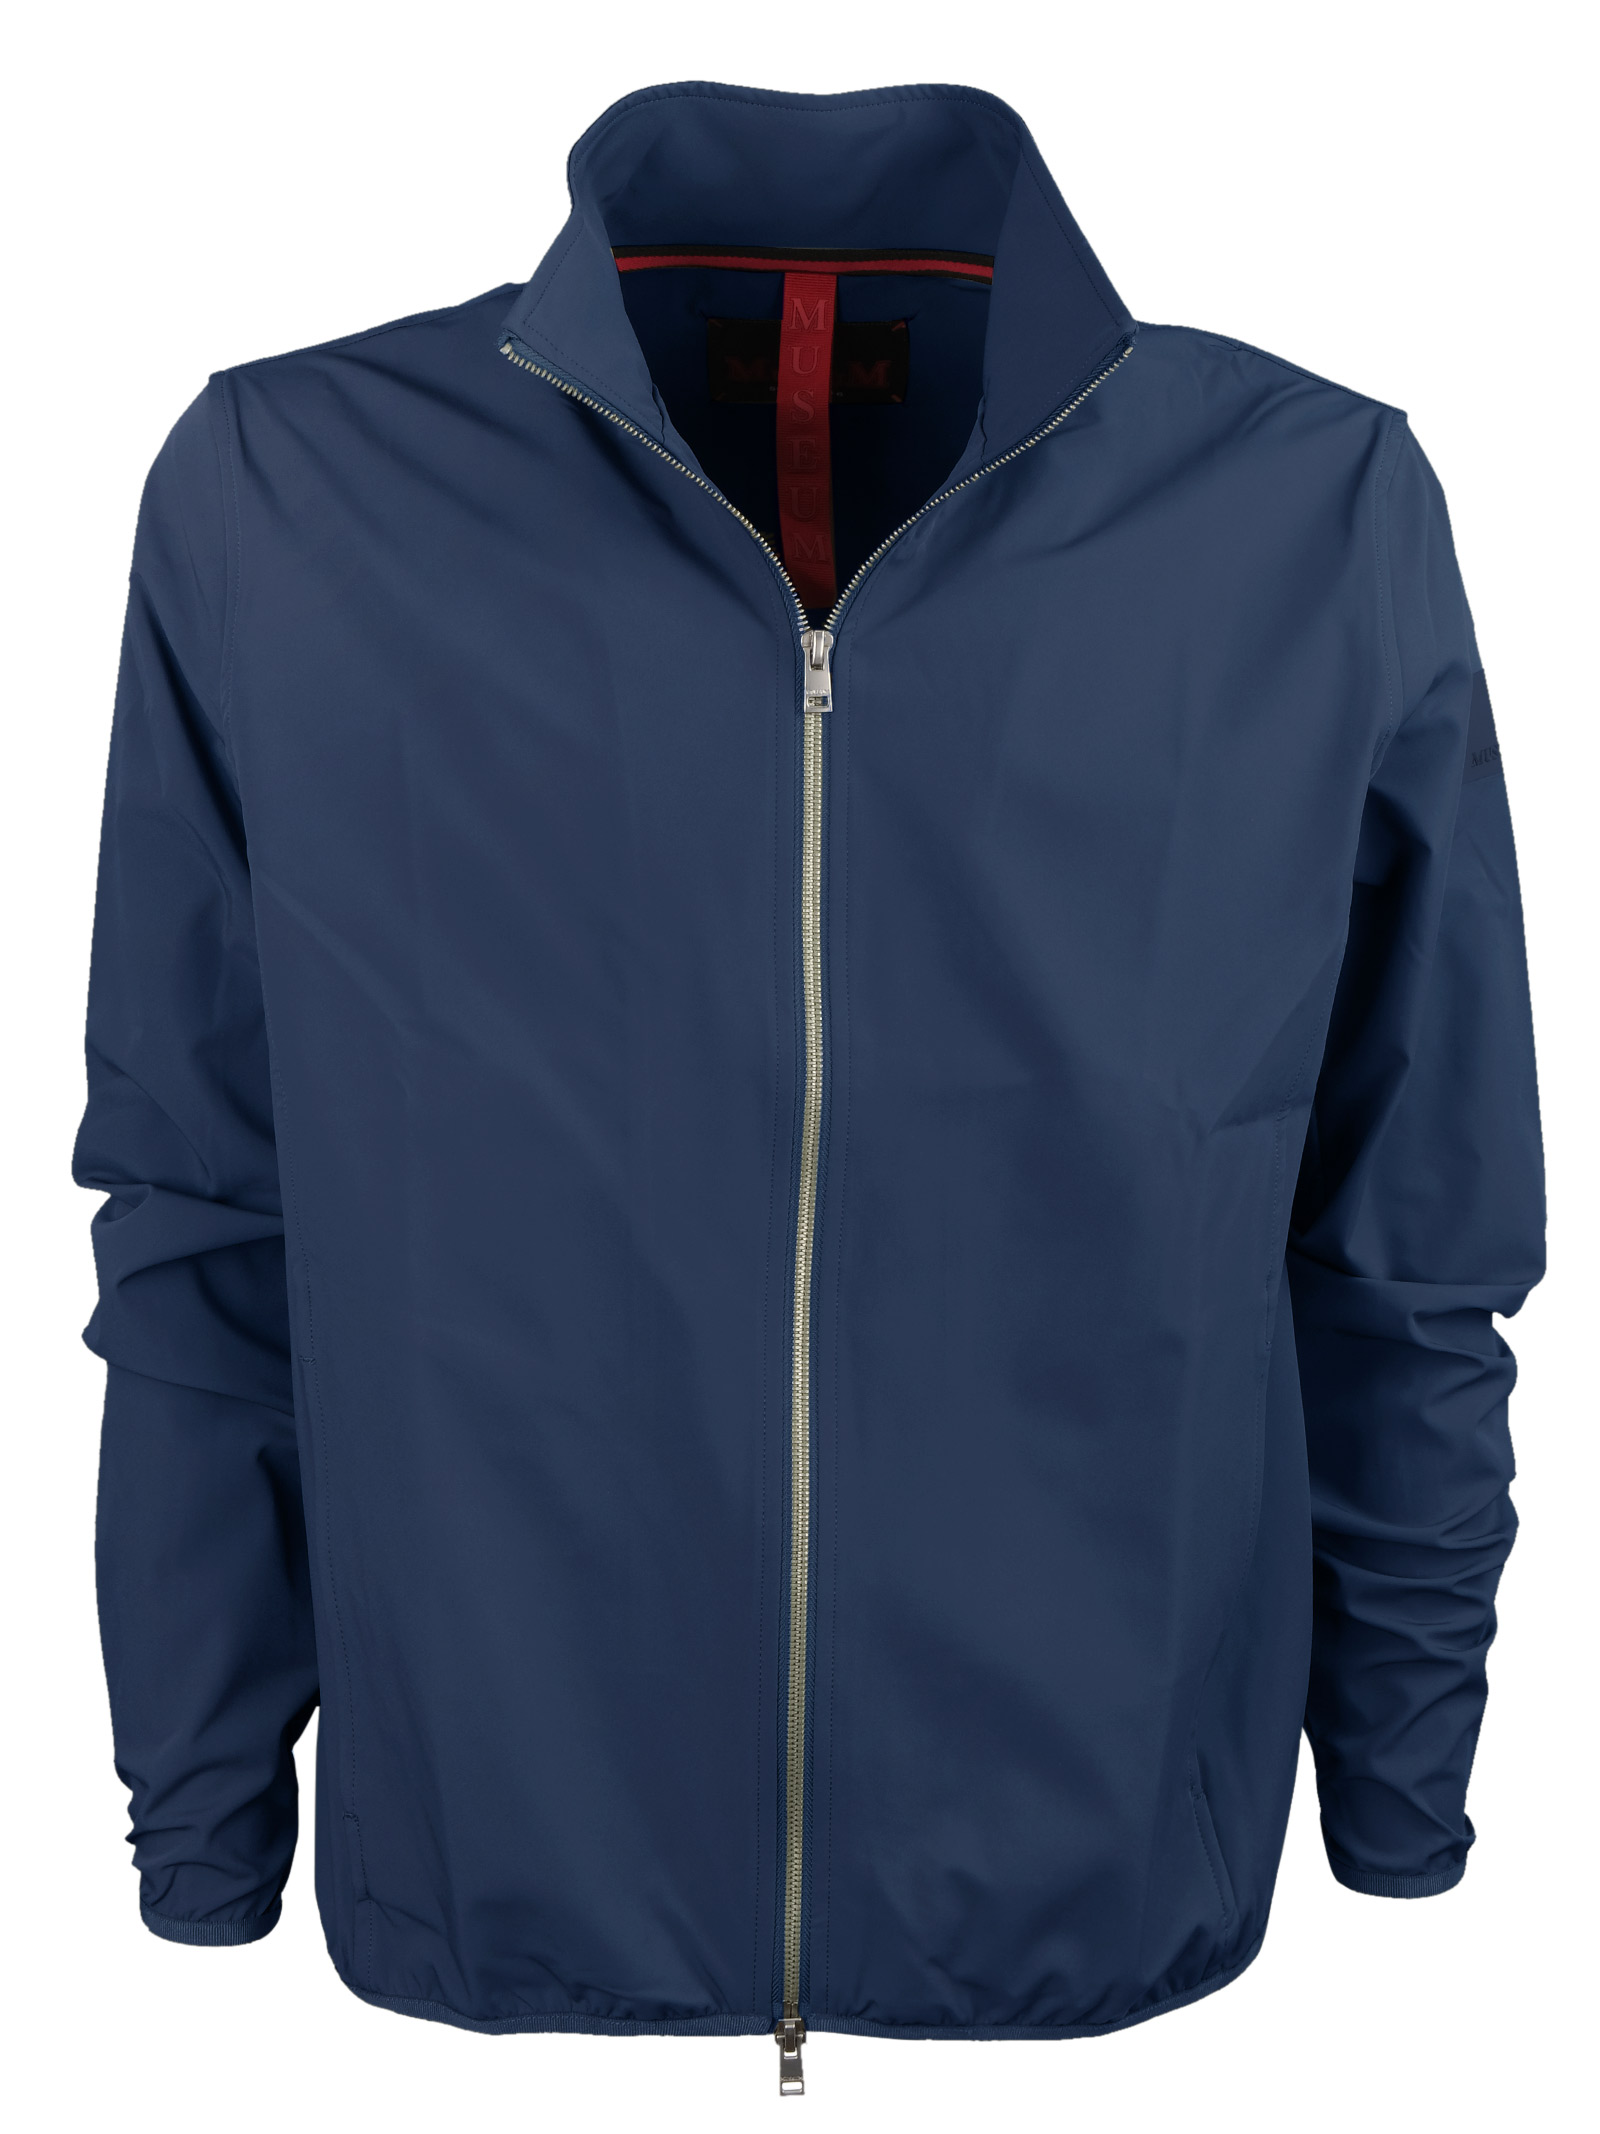 Stretch and light jacket MUSEUM | Jackets | TREVOR NY919C037